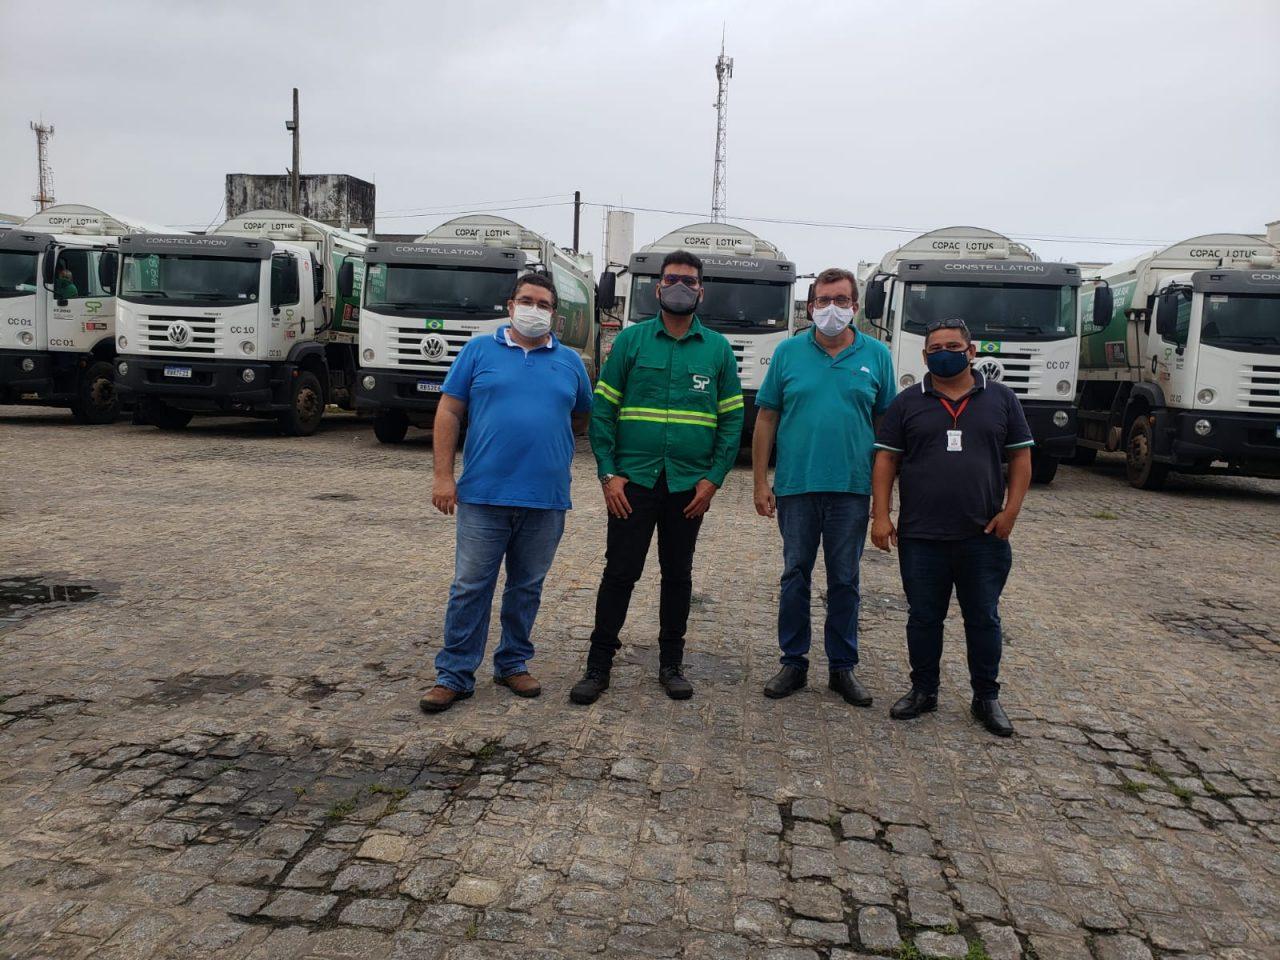 WhatsApp Image 2021 07 19 at 5.42.44 PM scaled - Prefeitura de Conde regulariza coleta de lixo e empresas concorrentes atestam lisura do processo